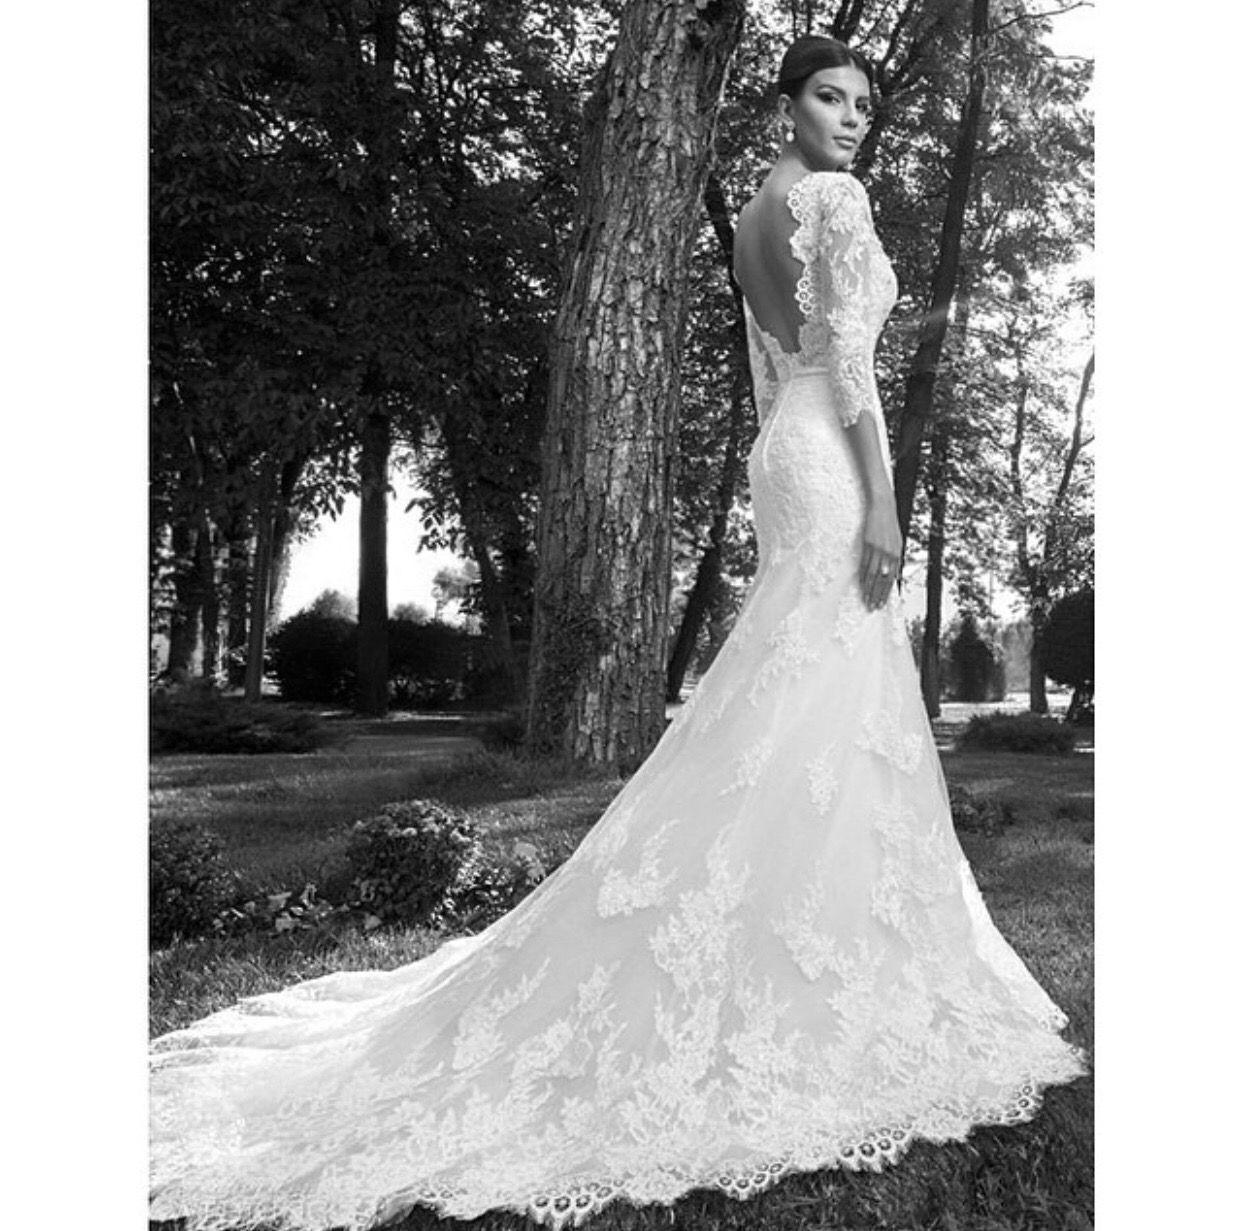 Lace sleeve mermaid wedding dress  Lace long skirt open back  Dresses we love  Pinterest  Wedding